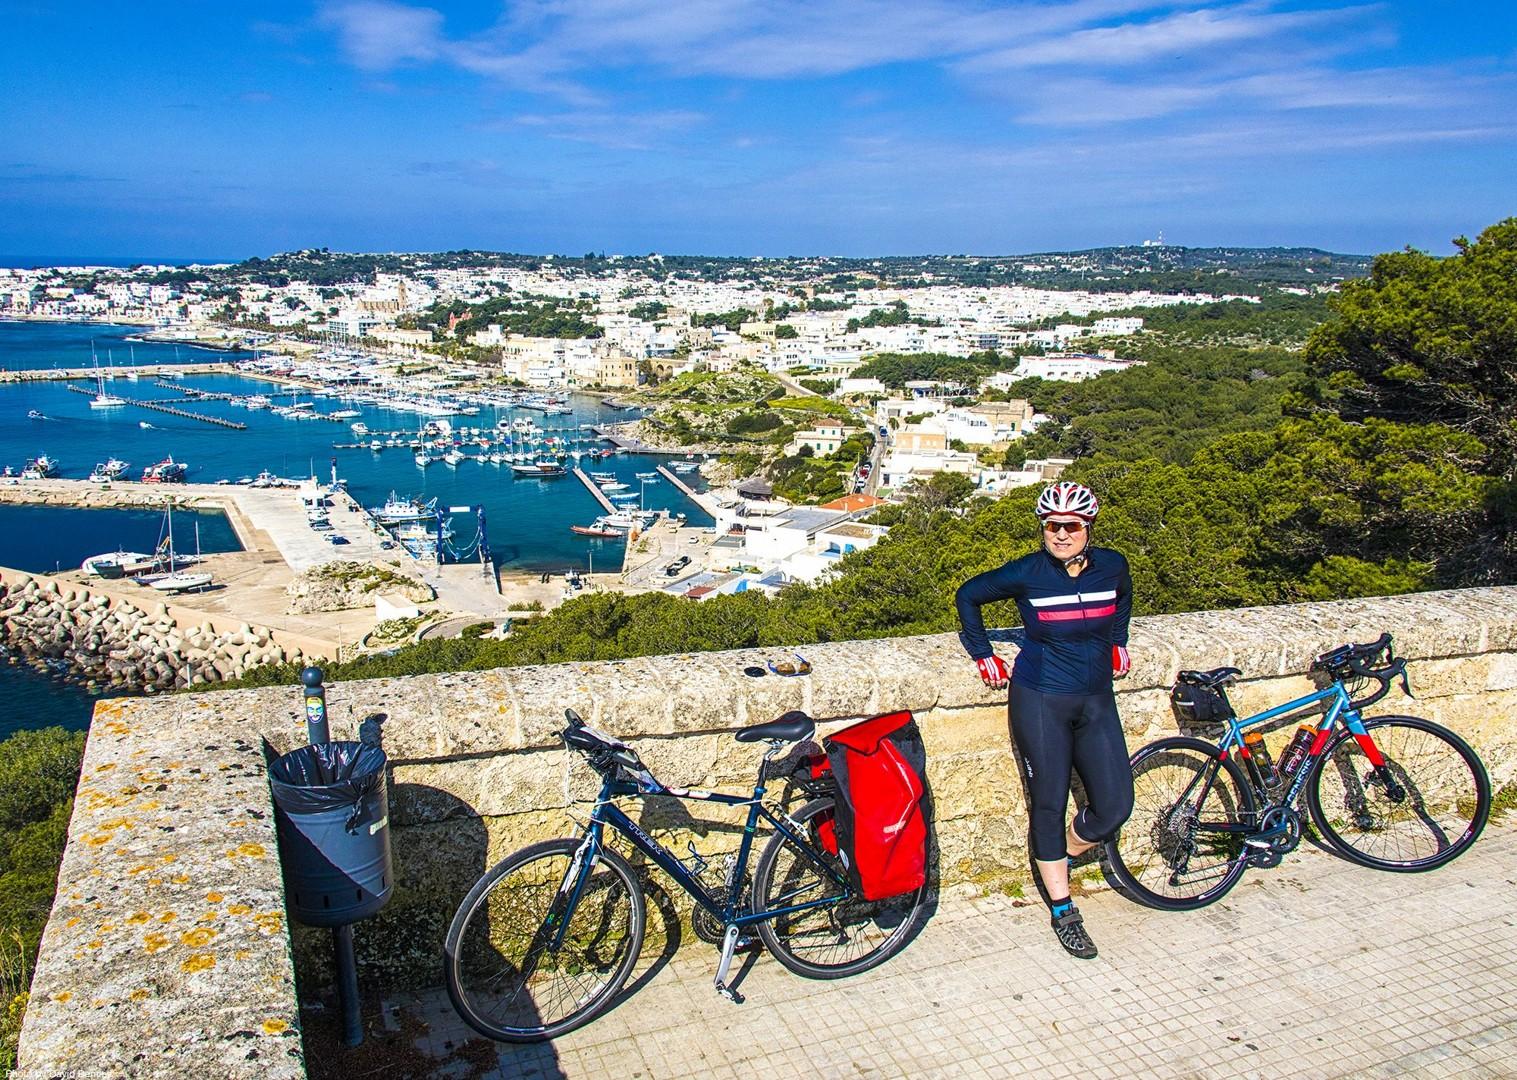 Puglia_0019-2.jpg - Italy - Puglia - Self-Guided Leisure Cycling Holiday - Leisure Cycling